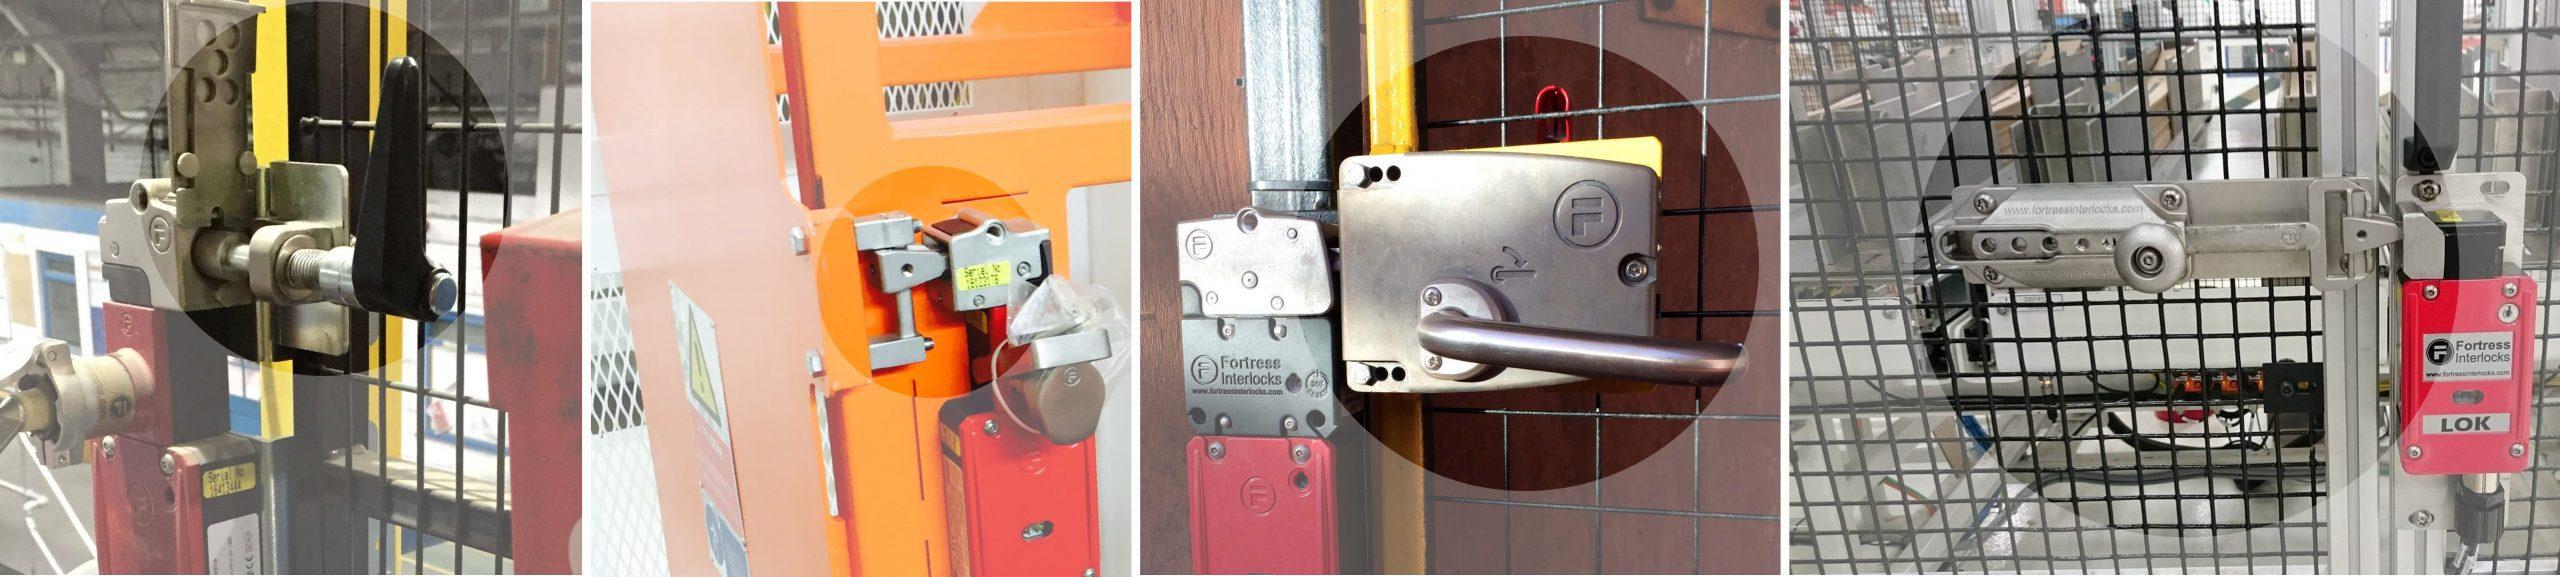 Heavy Duty Actuators Installation Images